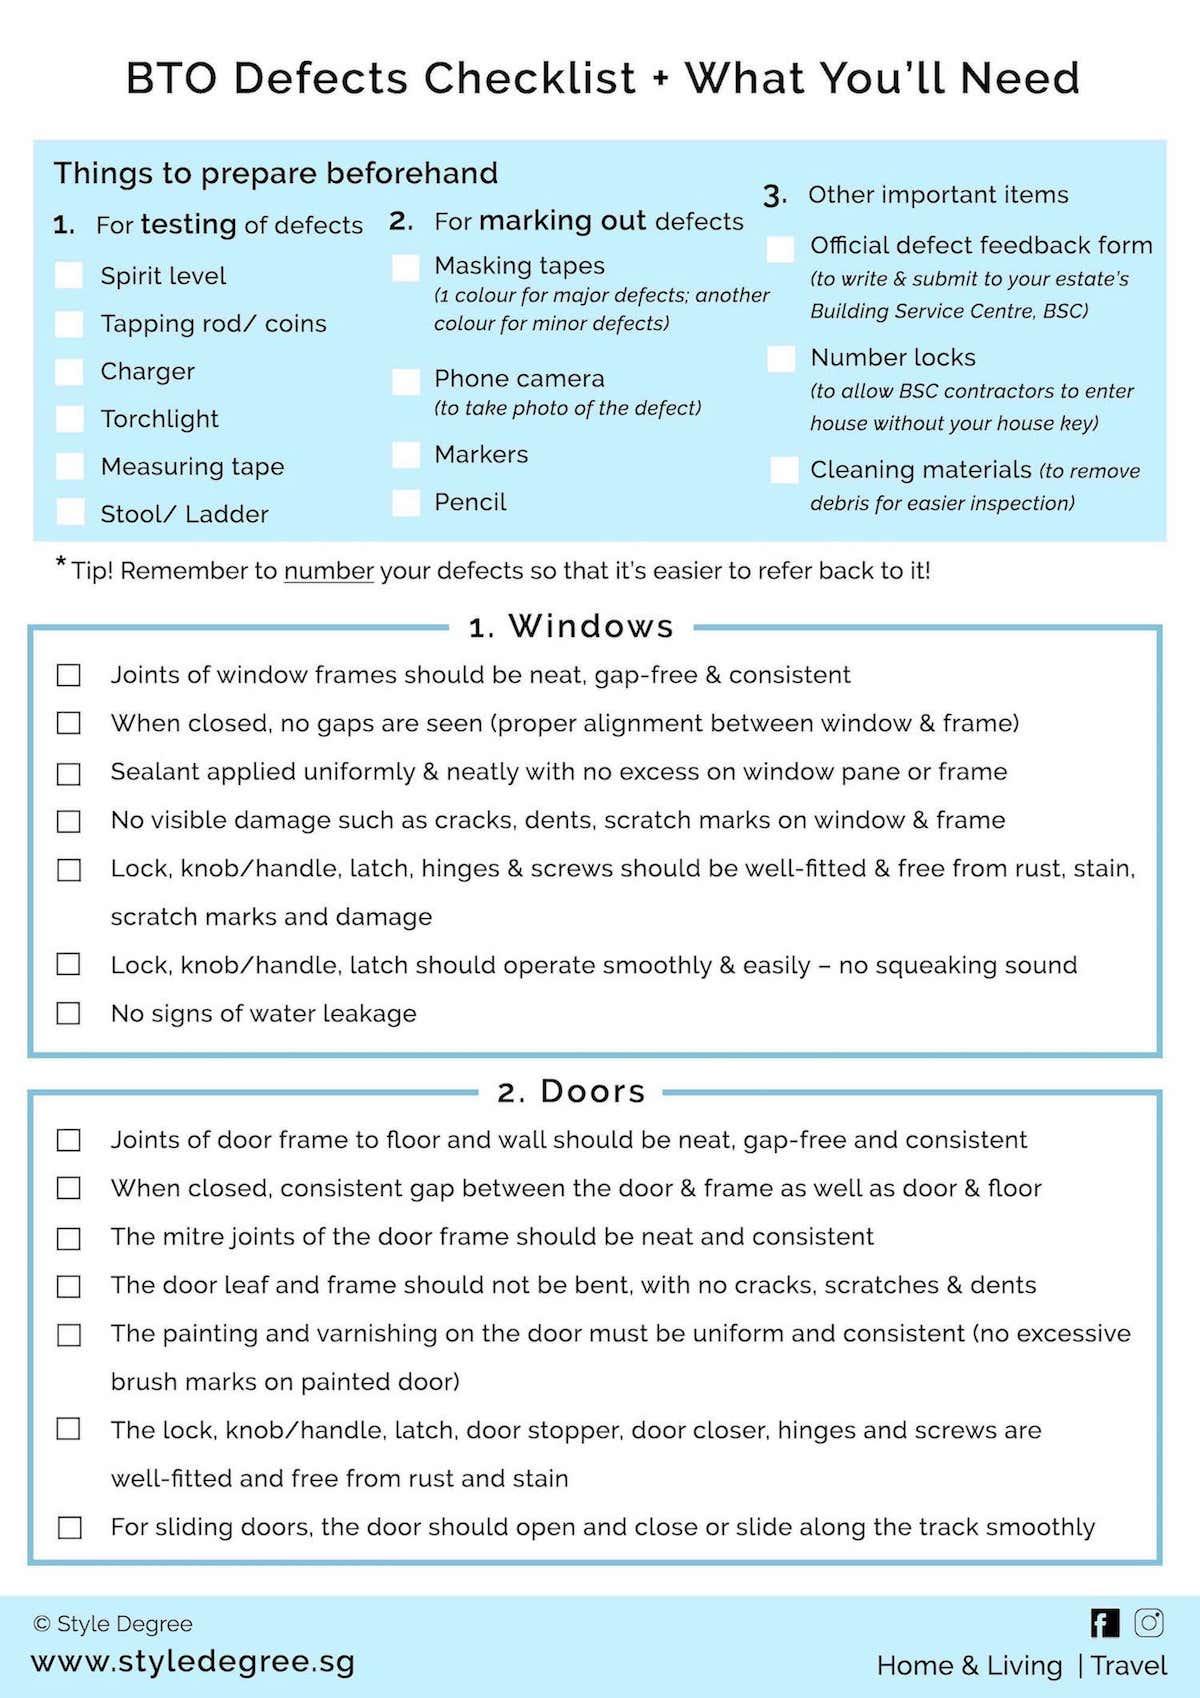 HDB BTO Defects Checklist PDF download comprehensive checklist